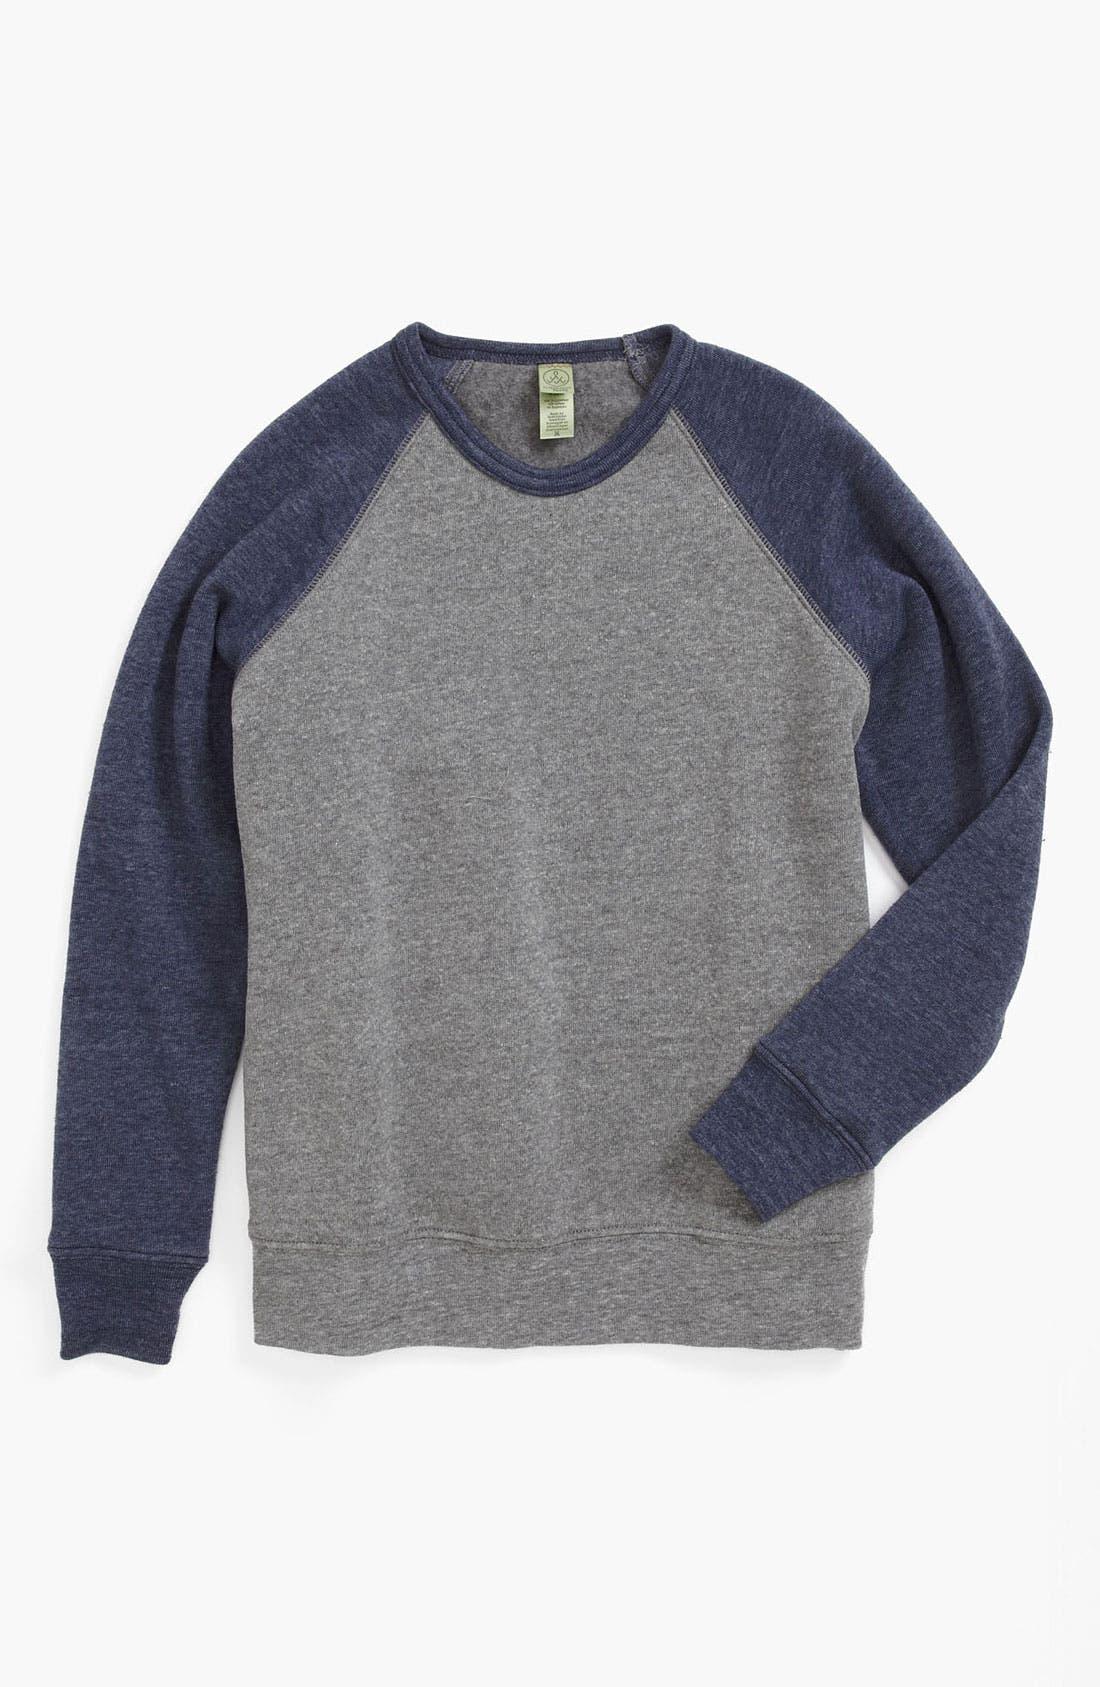 Alternate Image 1 Selected - Alternative Colorblock Sweatshirt (Big Boys)